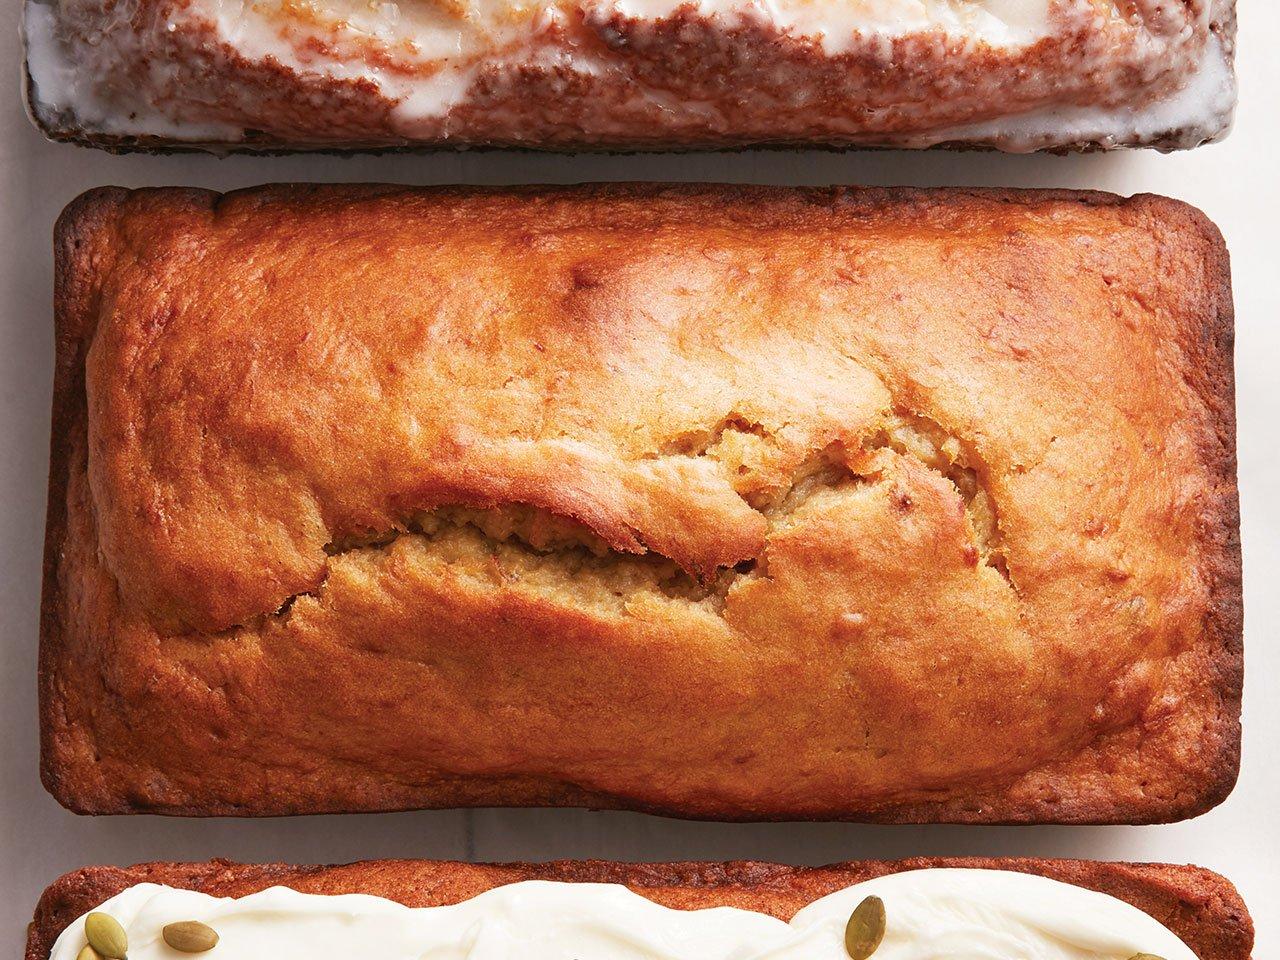 Cricket powder works in banana bread. Photo: banana bread loaf.